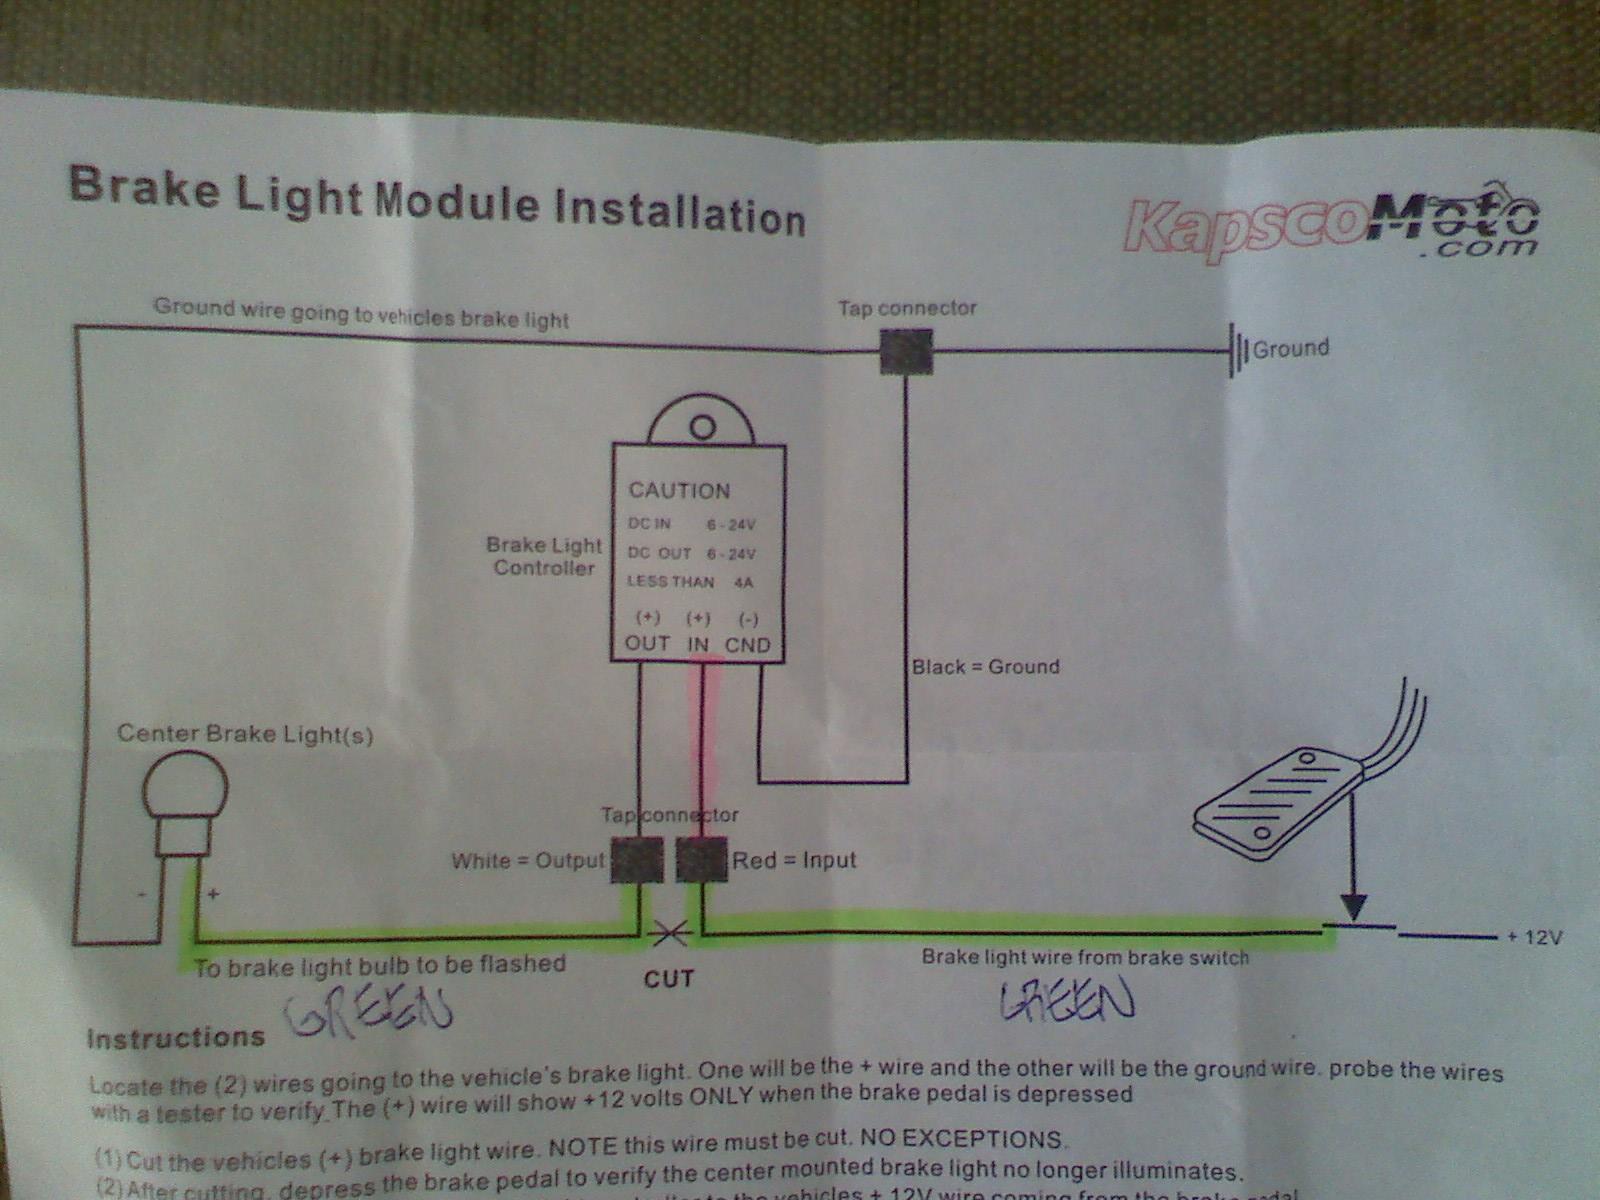 FY_1924] Vino 125 Wiring Diagram Schematic WiringOnica Knie Dict Vira Mohammedshrine Librar Wiring 101